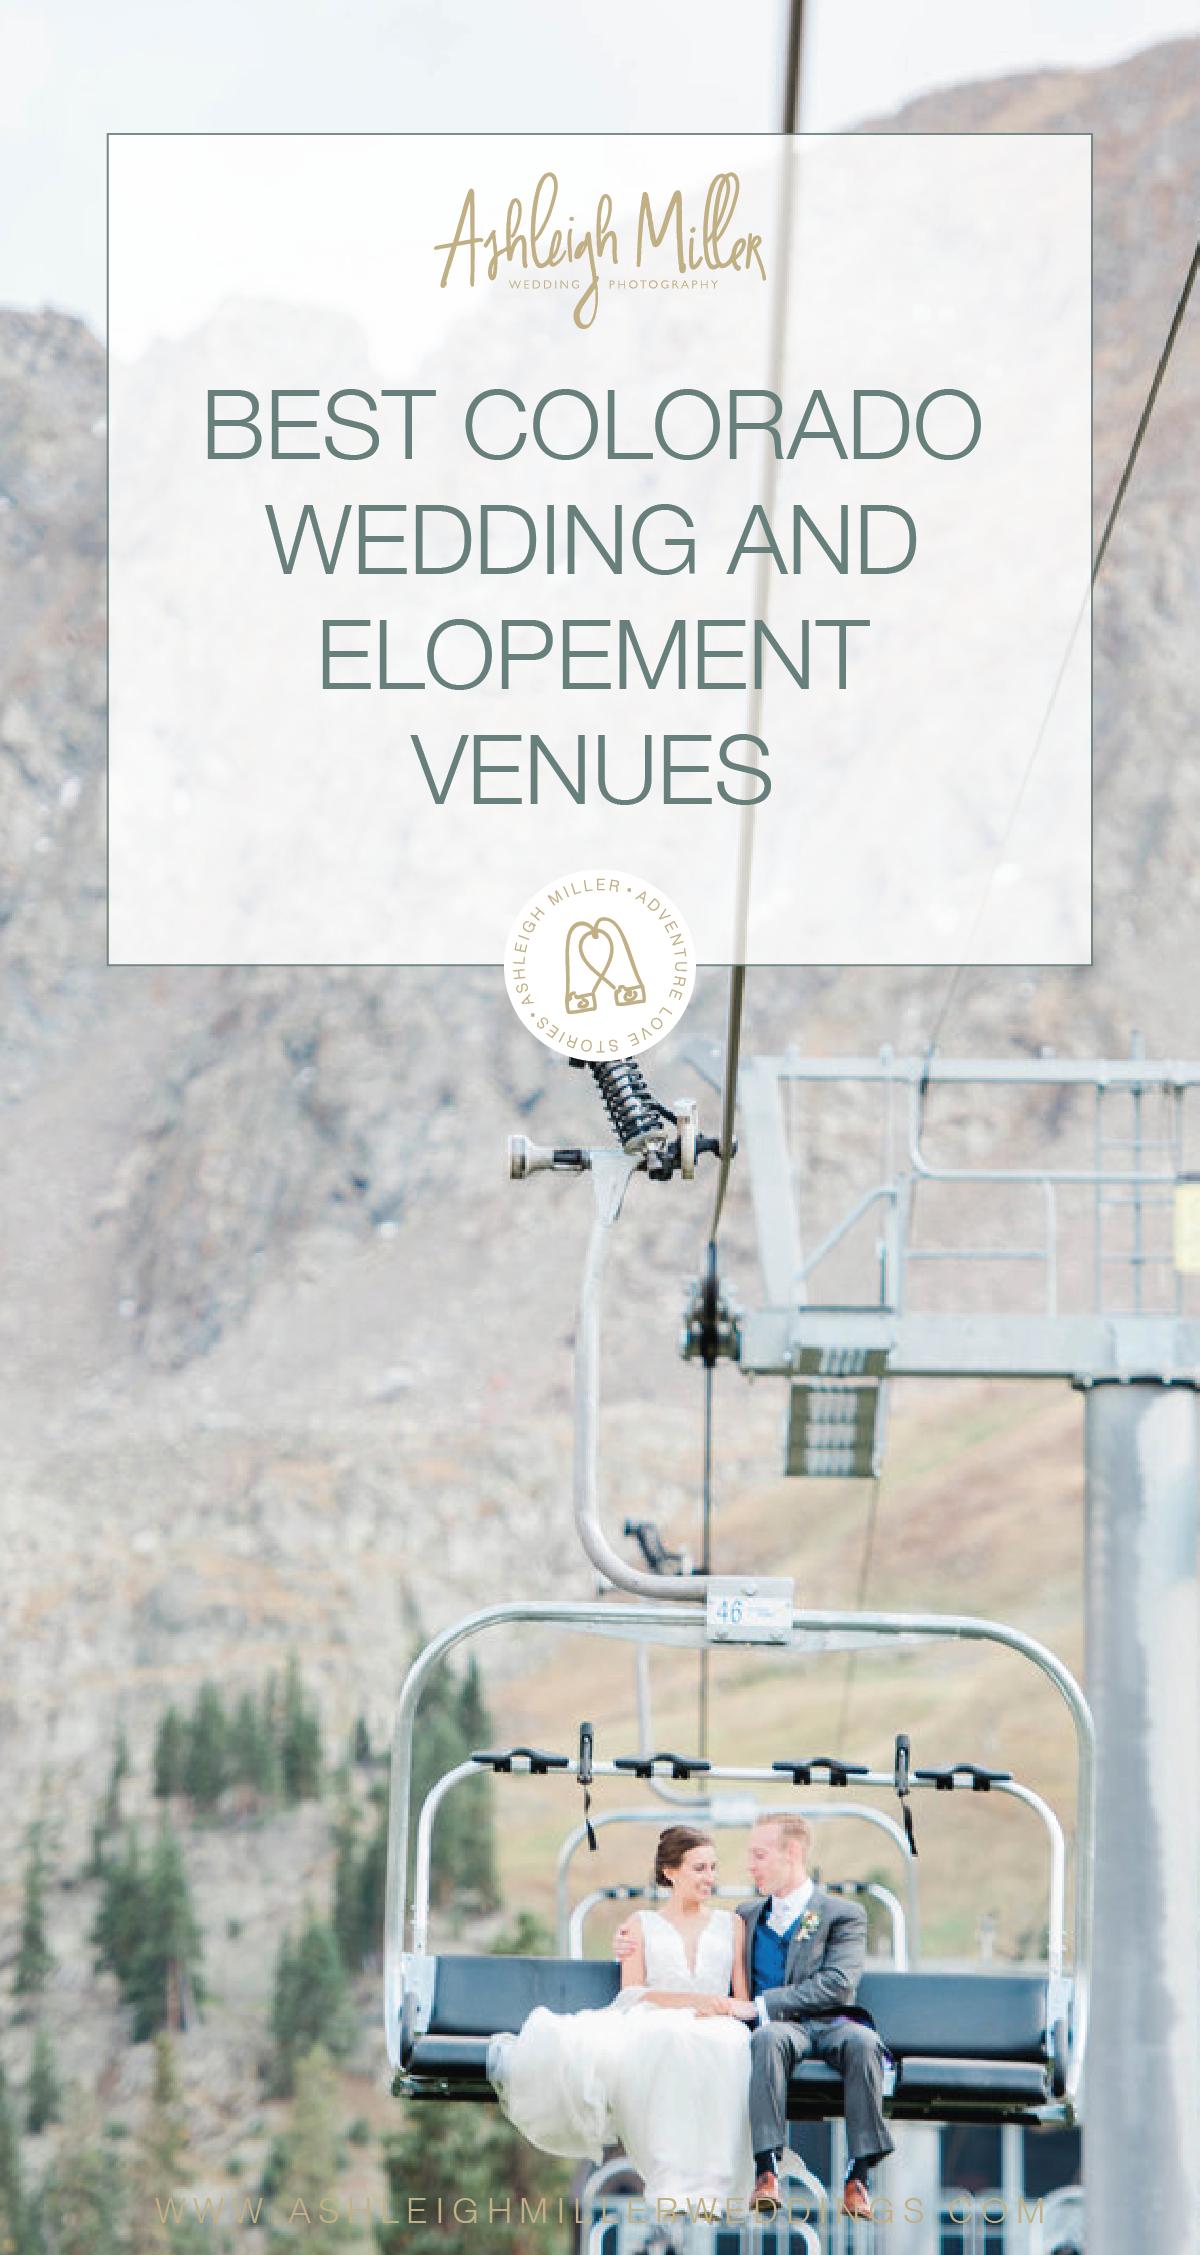 Best-Colorado-Wedding-and-Elopement-Venues-02.png